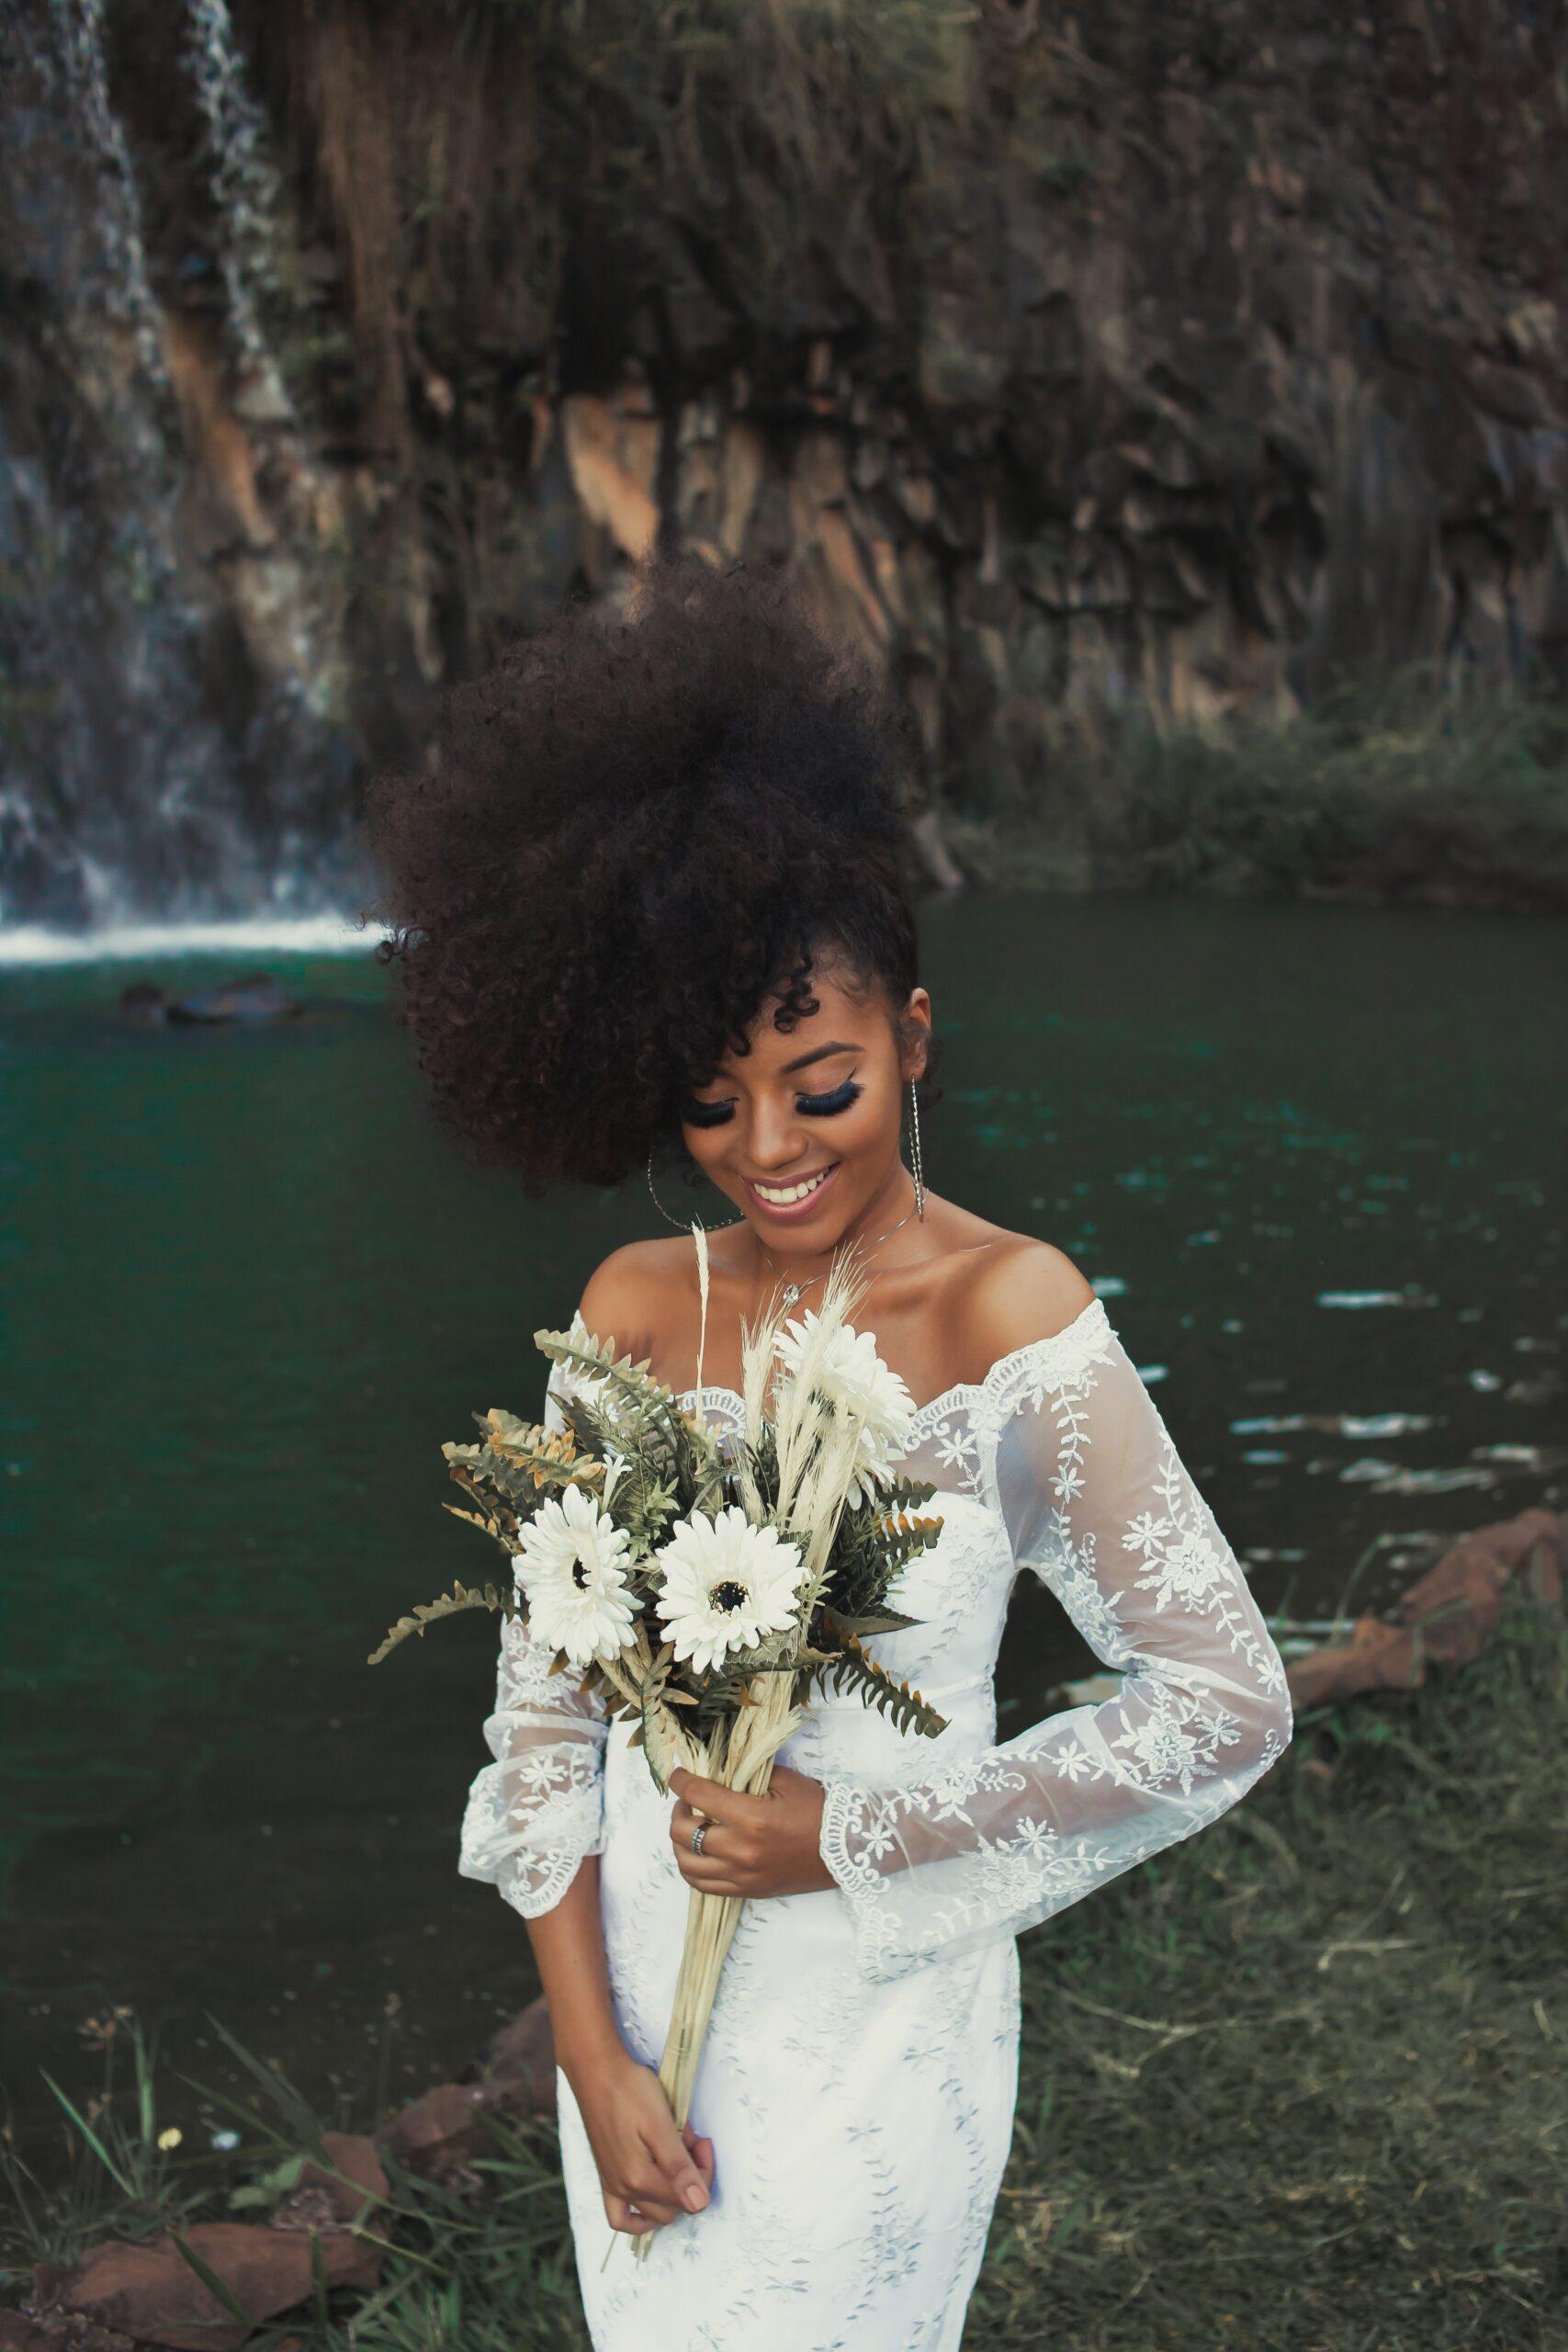 Lacey nature inspired wedding dress San Antonio